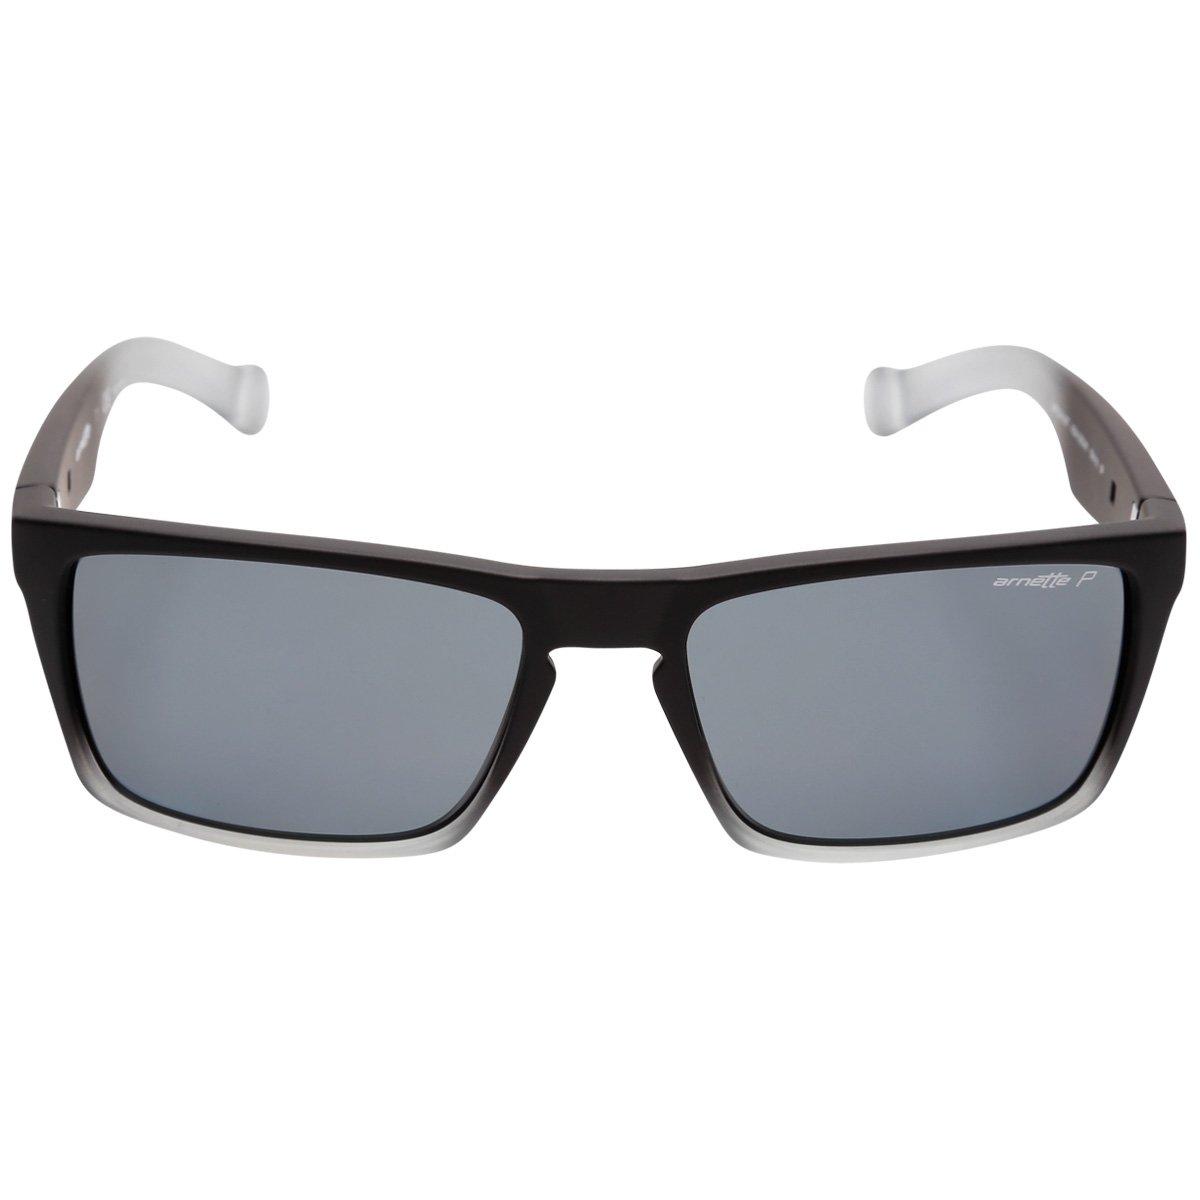 d248c1da37621 Óculos de Sol Arnette Specialist - Compre Agora   Netshoes